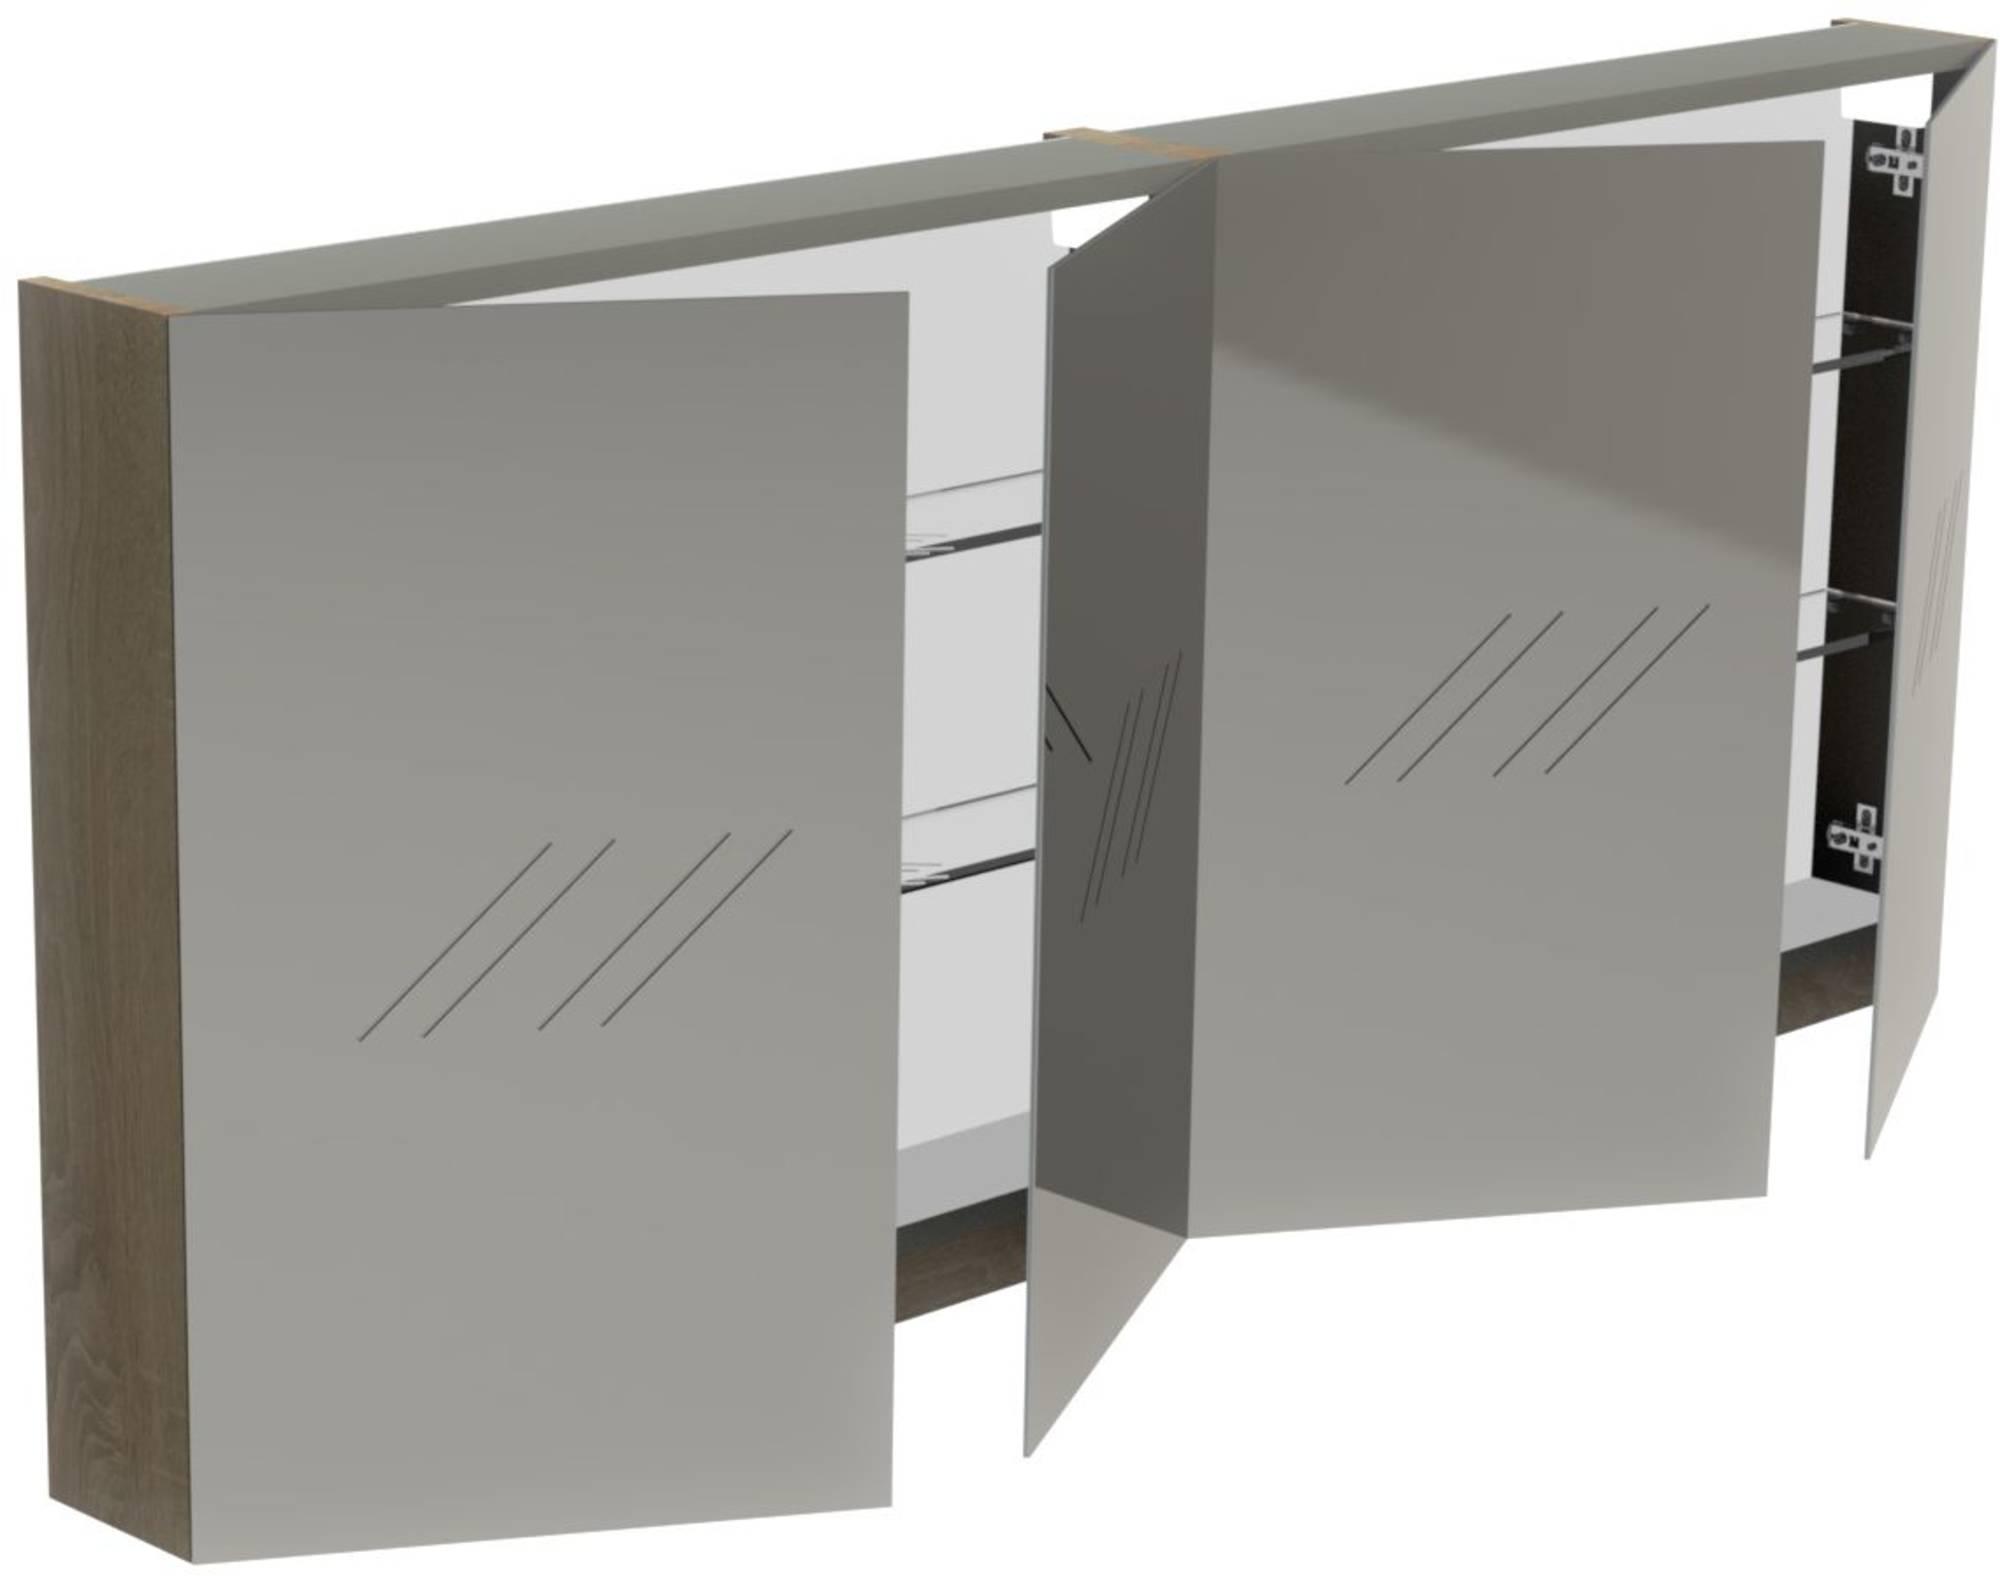 Thebalux Basic Spiegelkast 70x160x13,5 cm Jackson Pine